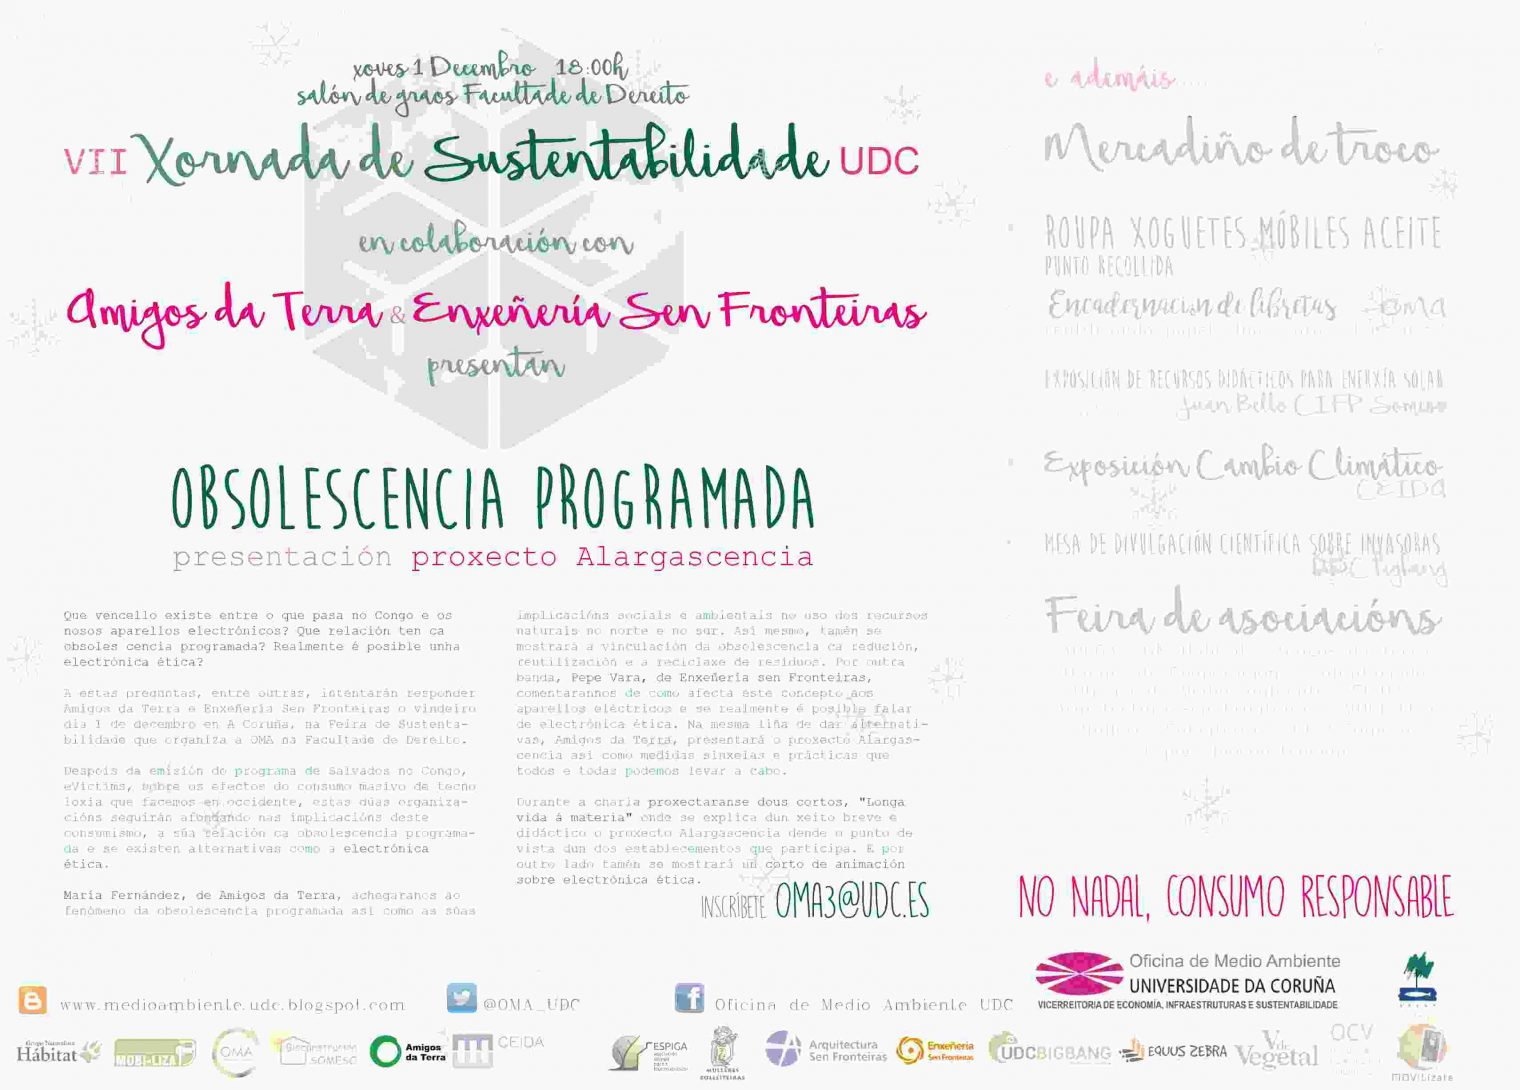 Ir a A Coruña: Coloquio sobre obsolescencia y electrónica ética